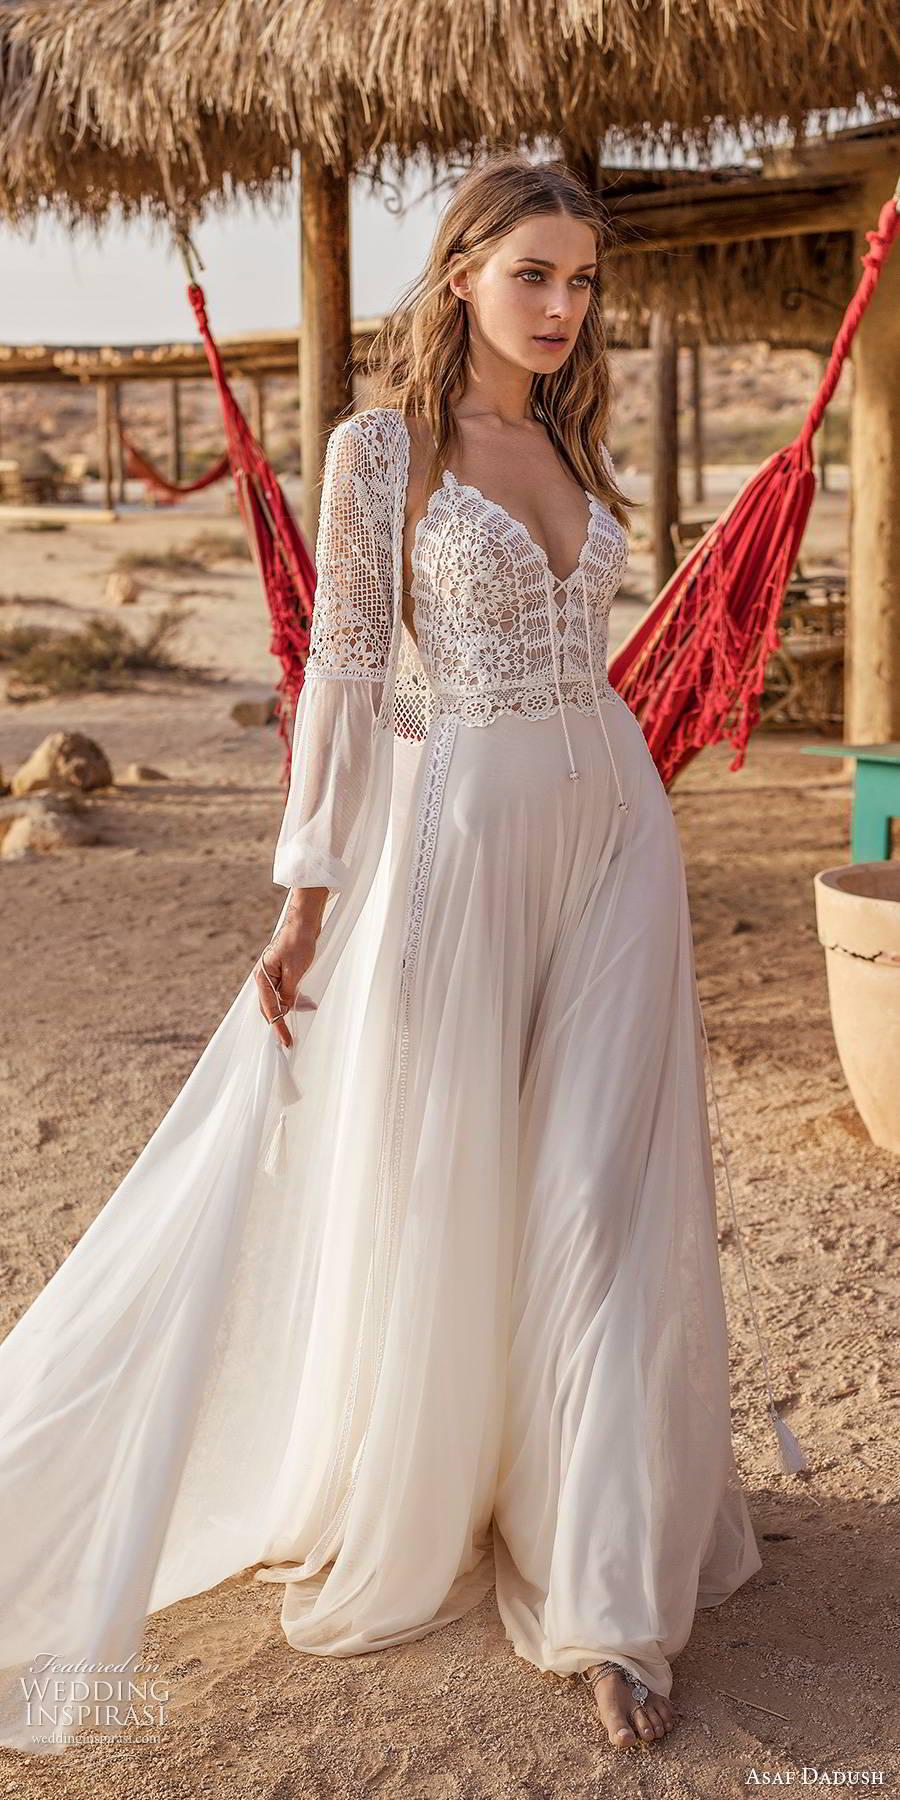 asaf dadush 2019 bridal sleeveless thin straps v neckline embellished bodice clean slit skirt boho romantic a line wedding dress jacket (9) mv